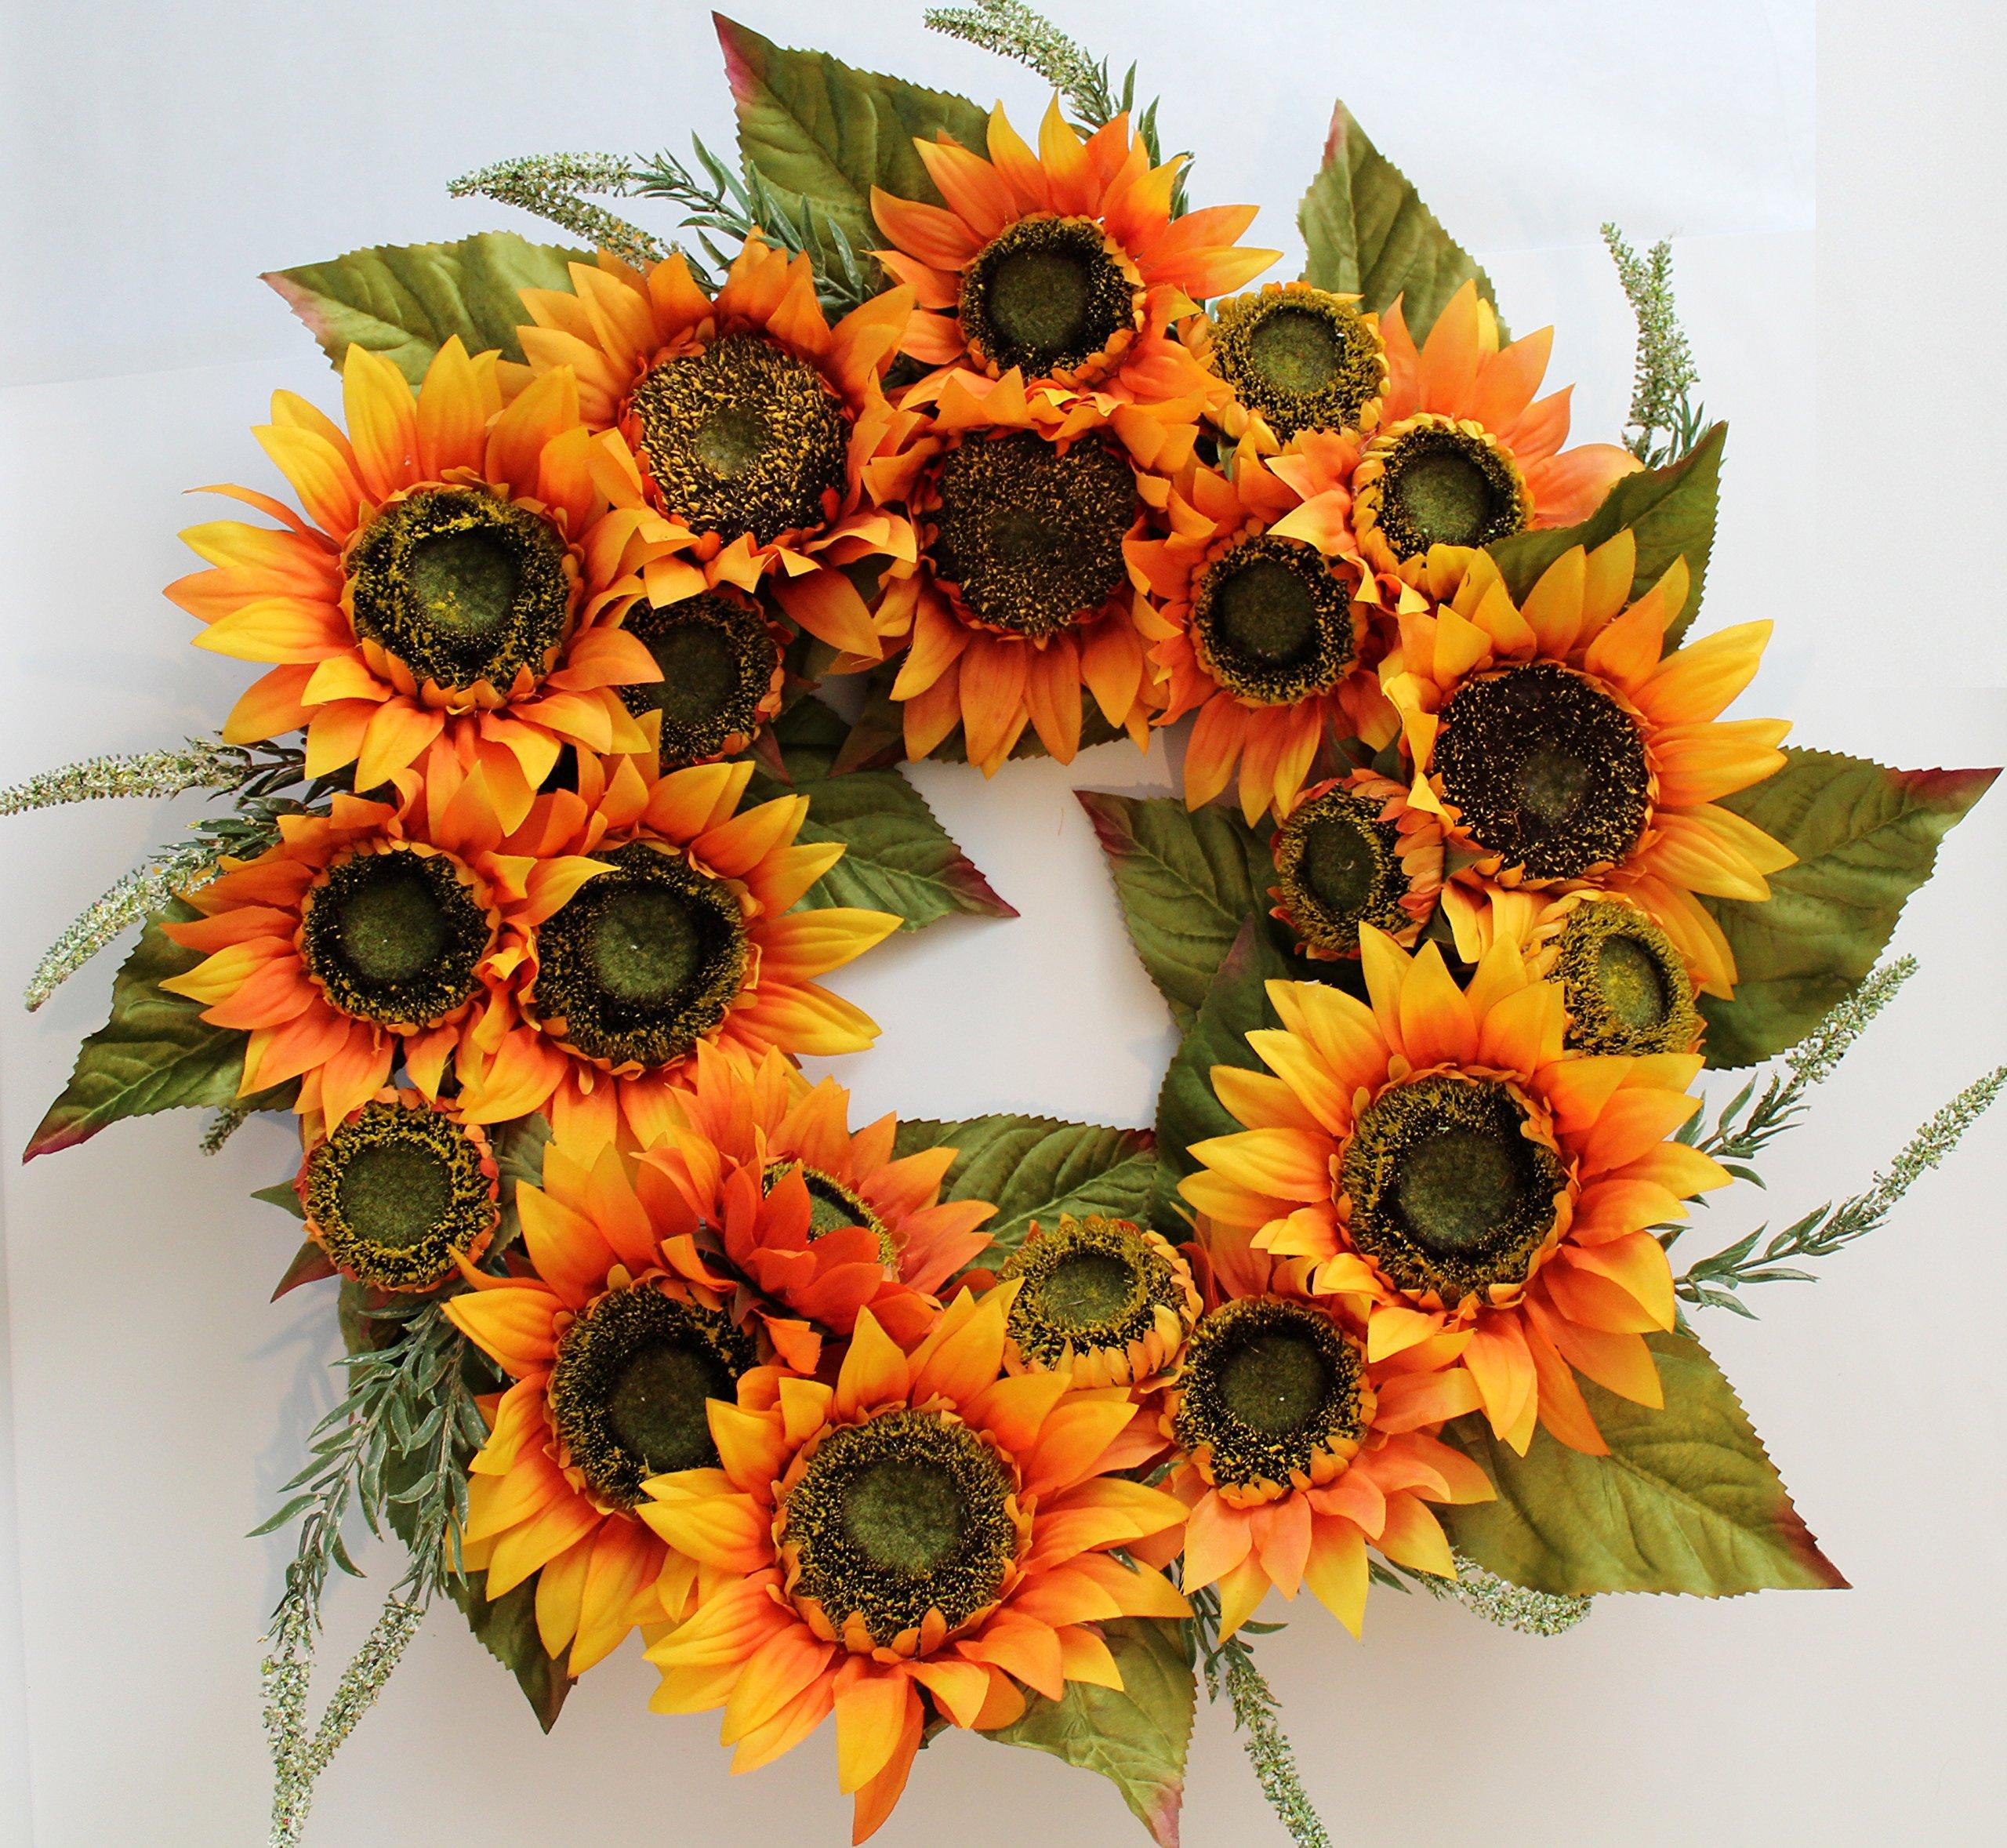 Buy melbourne silk sunflower front door wreath 22 inch handcrafted melbourne silk sunflower front door wreath 22 inch handcrafted with designer quality silk flowers mightylinksfo